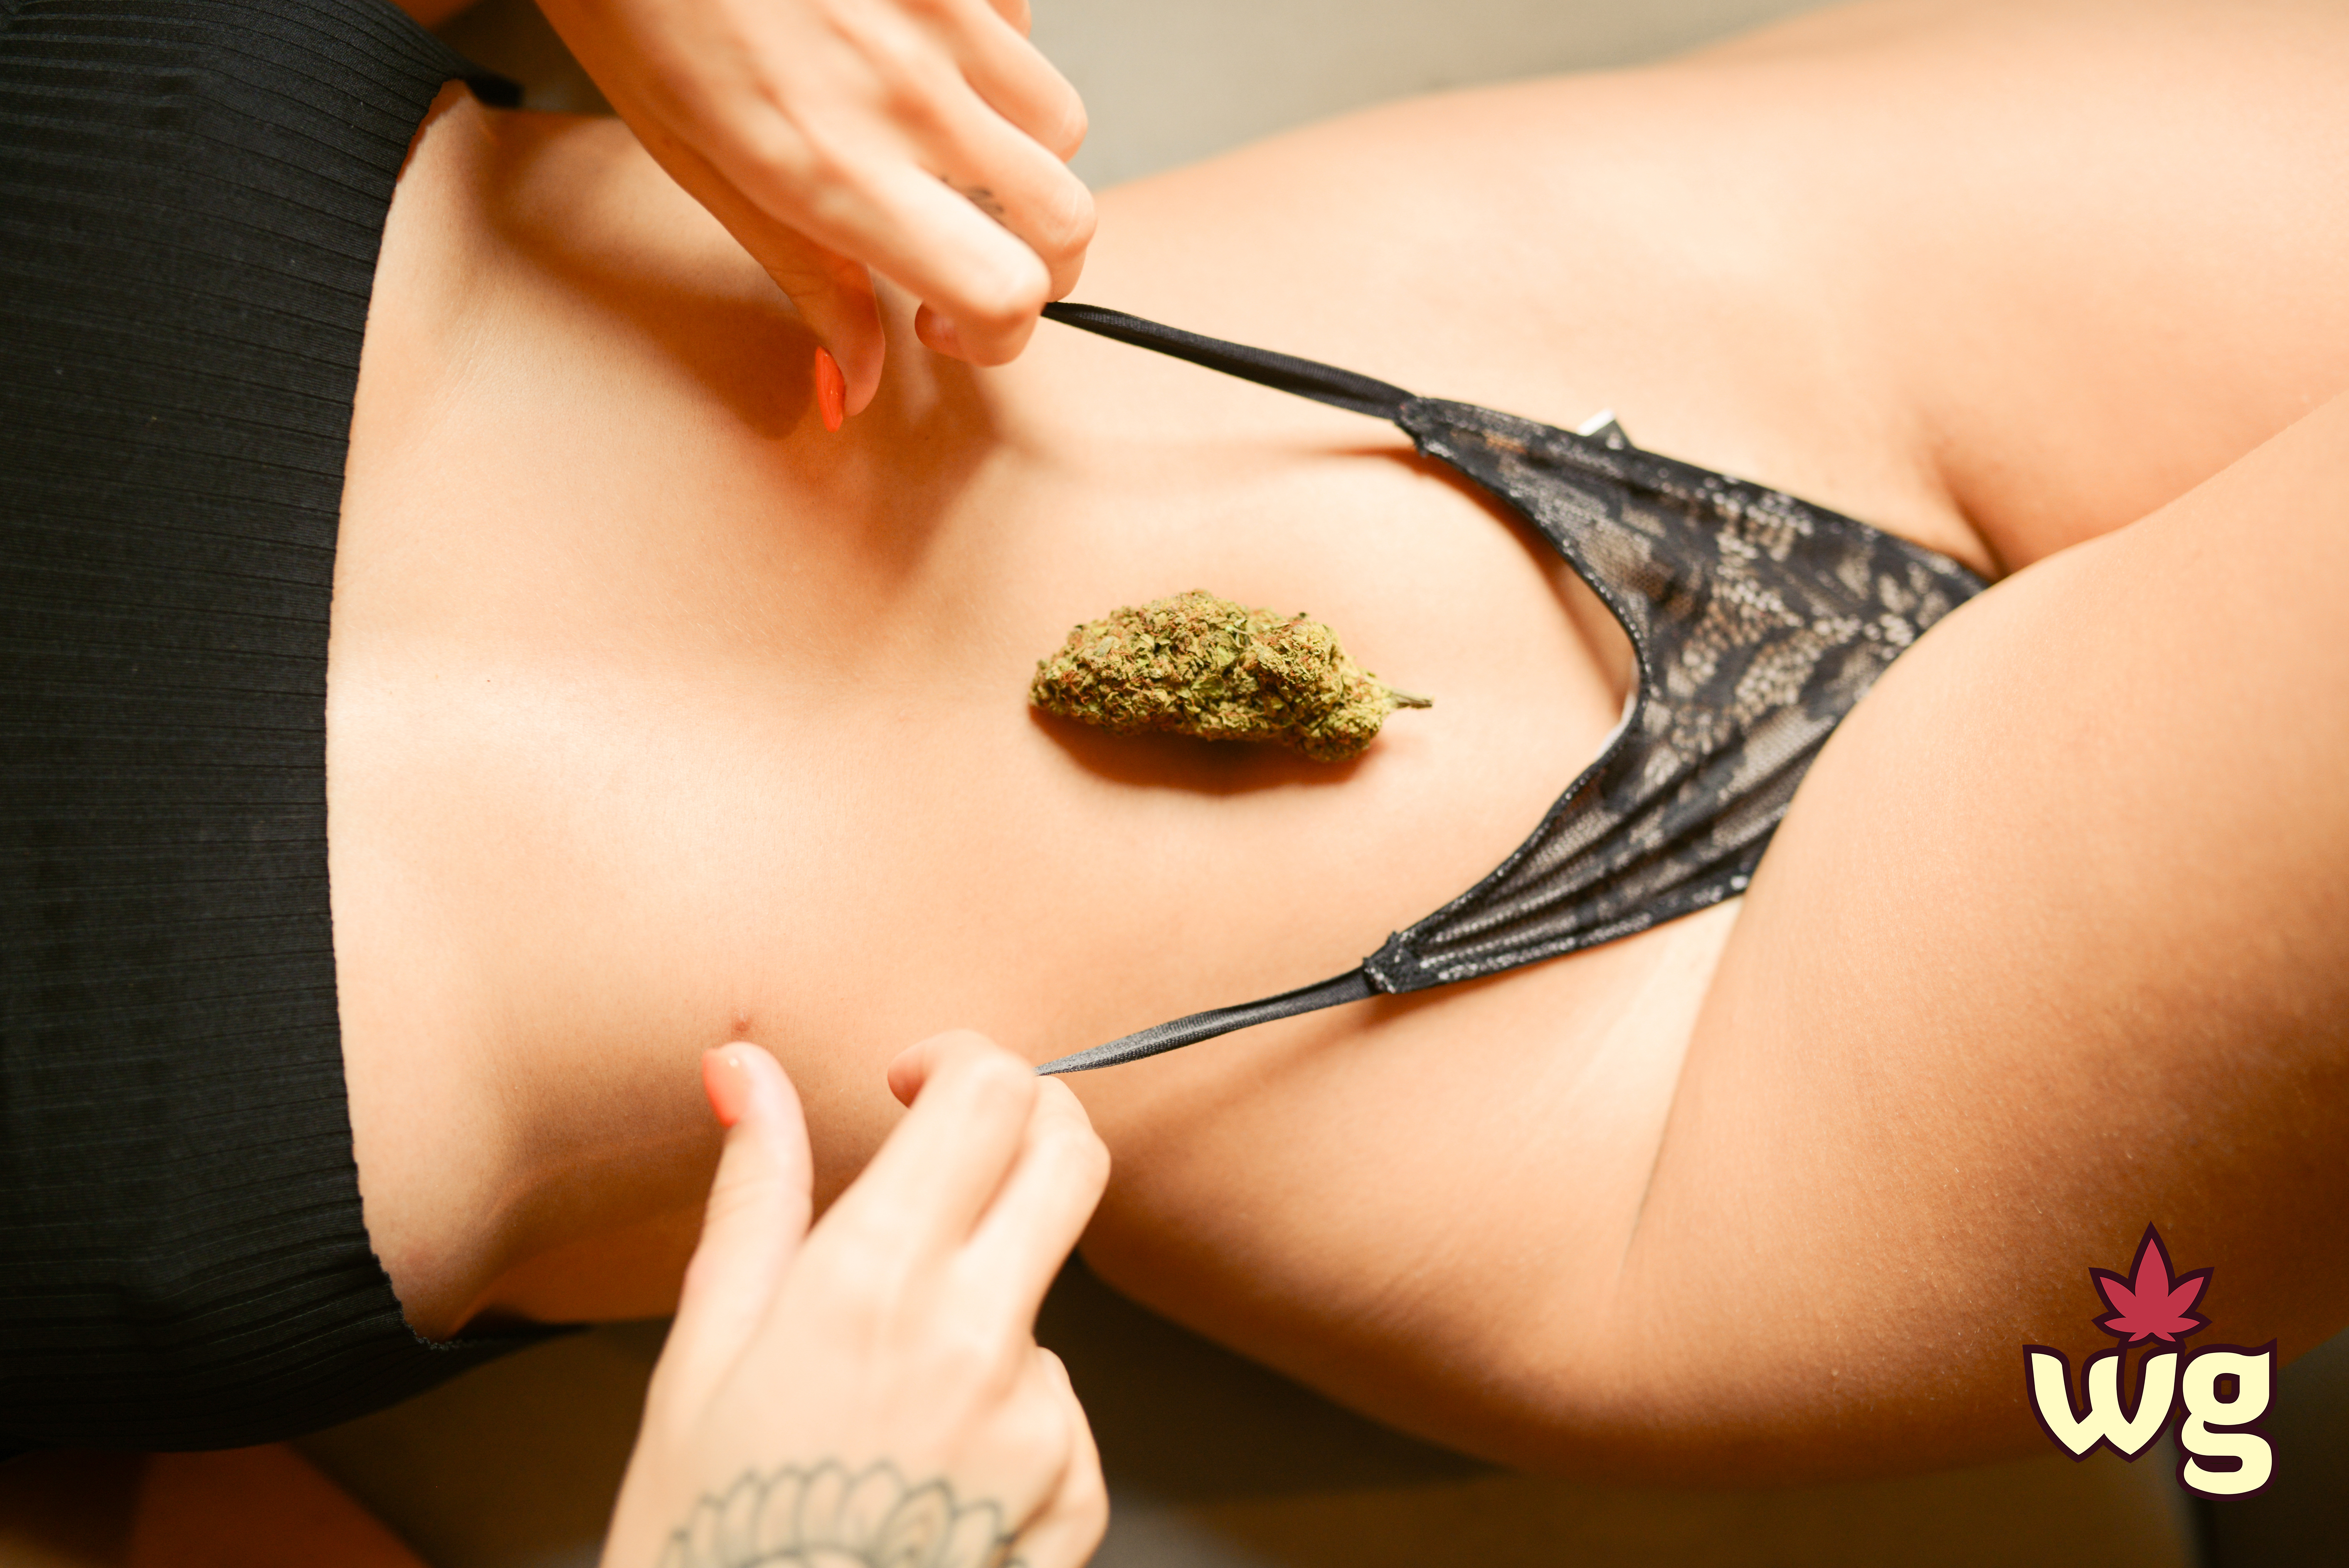 hot tattoo woman wearing sexy black underwear | cannabis buds | weed girls